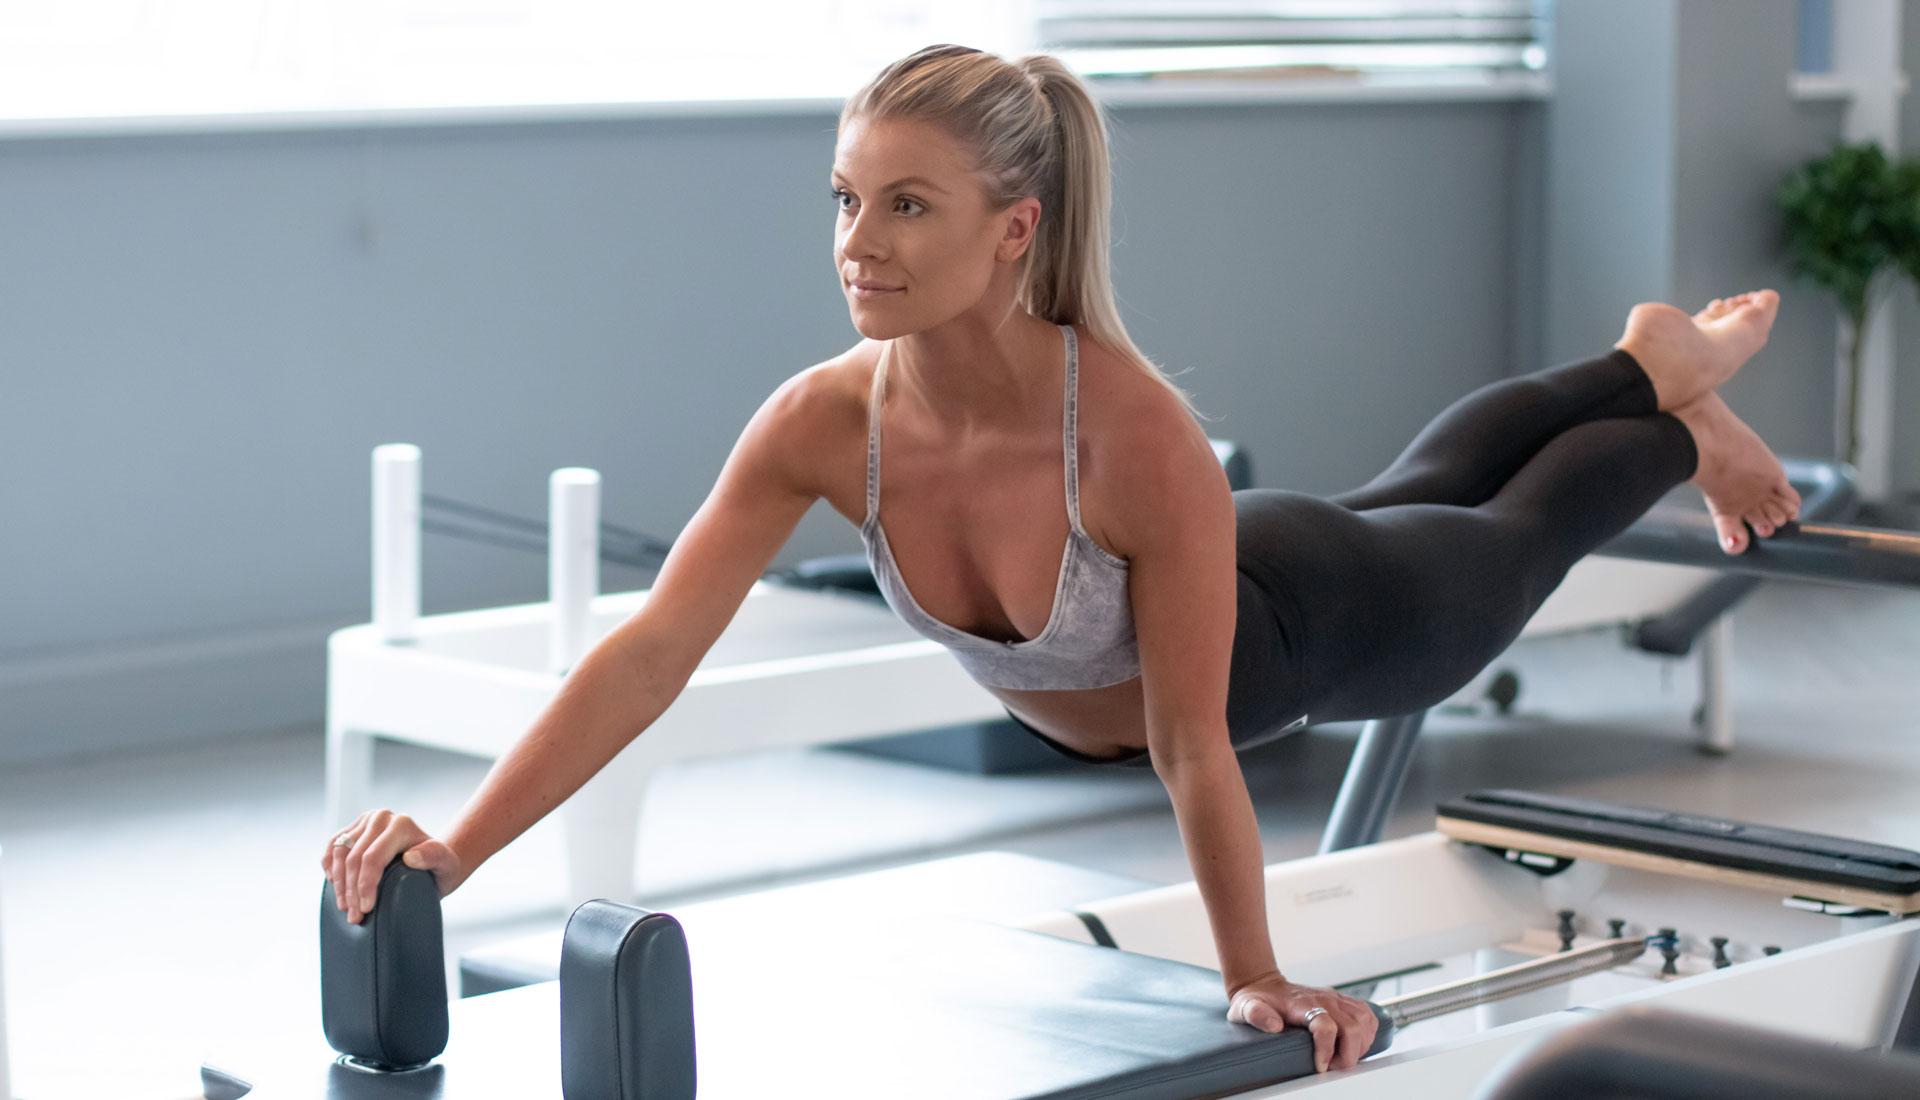 Blond woman doing pilates at the gym. Fitness photoshoot birmingham uk, fitness photographer UK, professional gym photography West Midlands